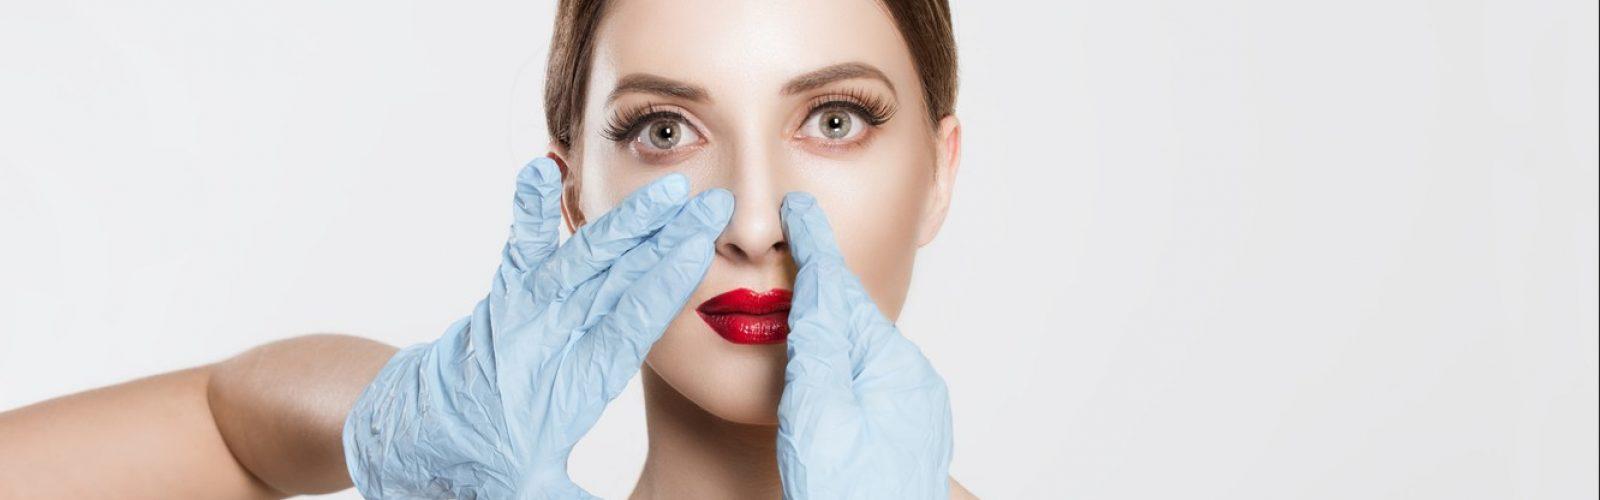 rhinoplasty-operation-woman-aesthetics